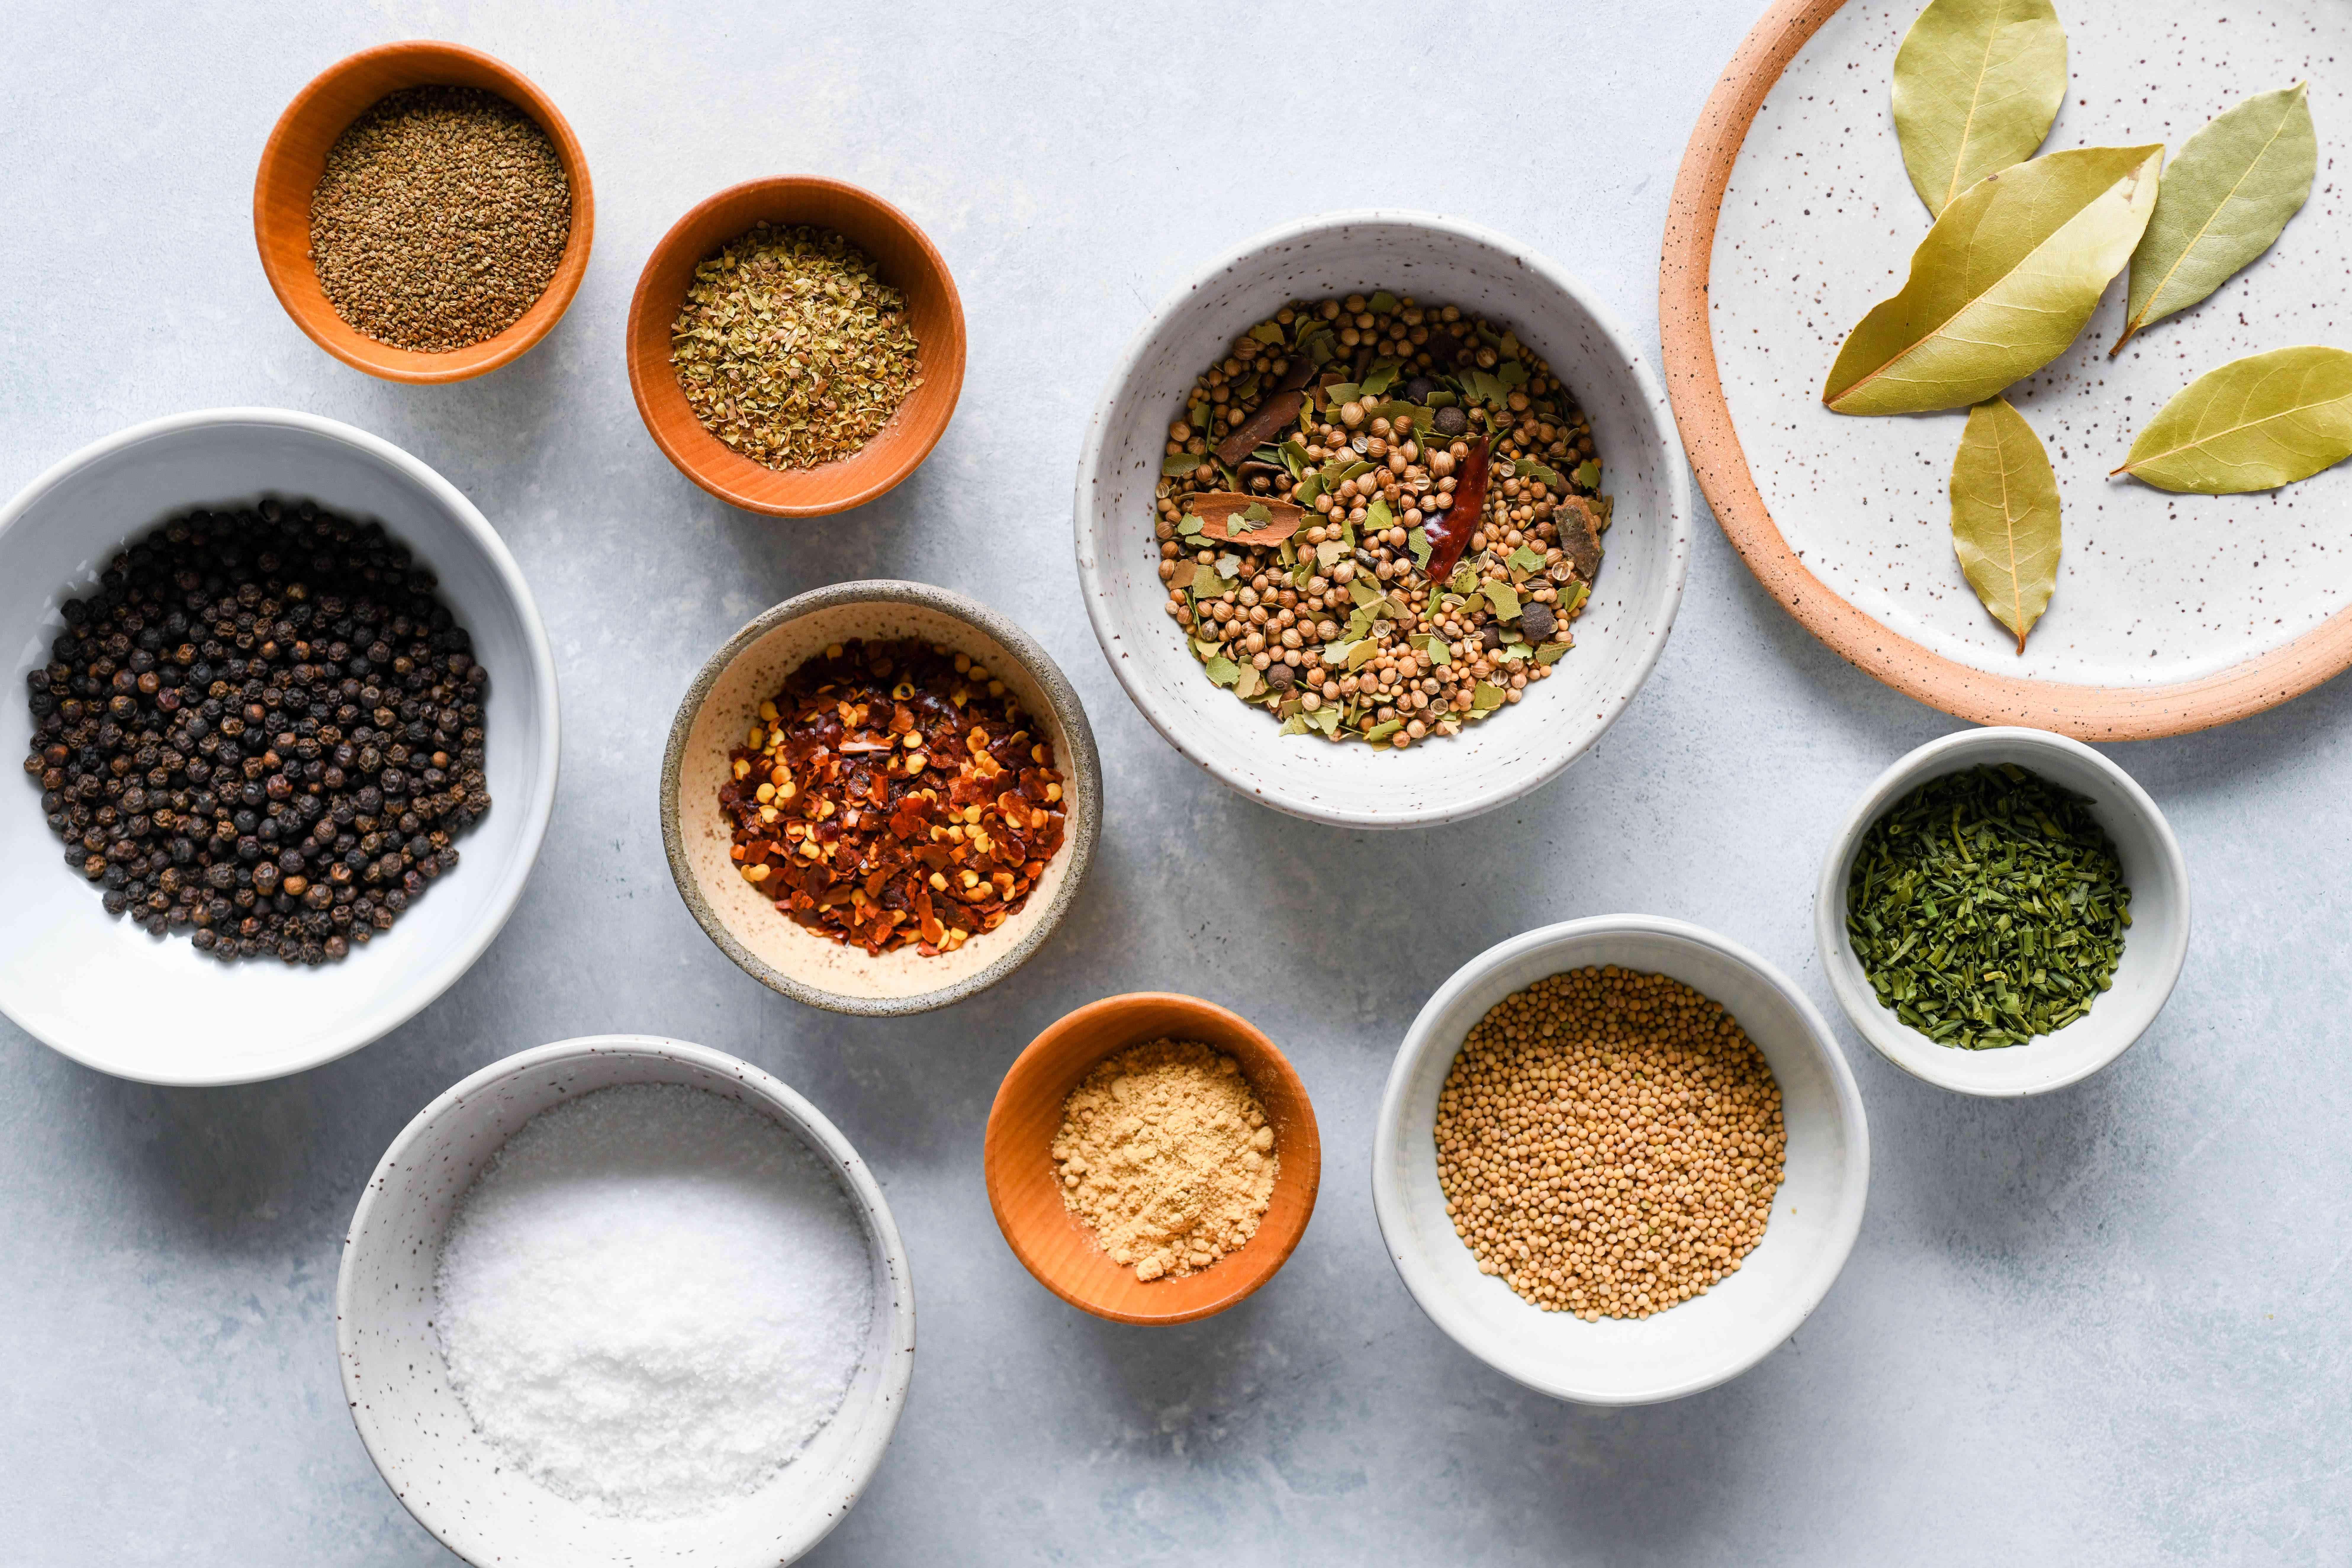 Crab Boil Spice Mix ingredients